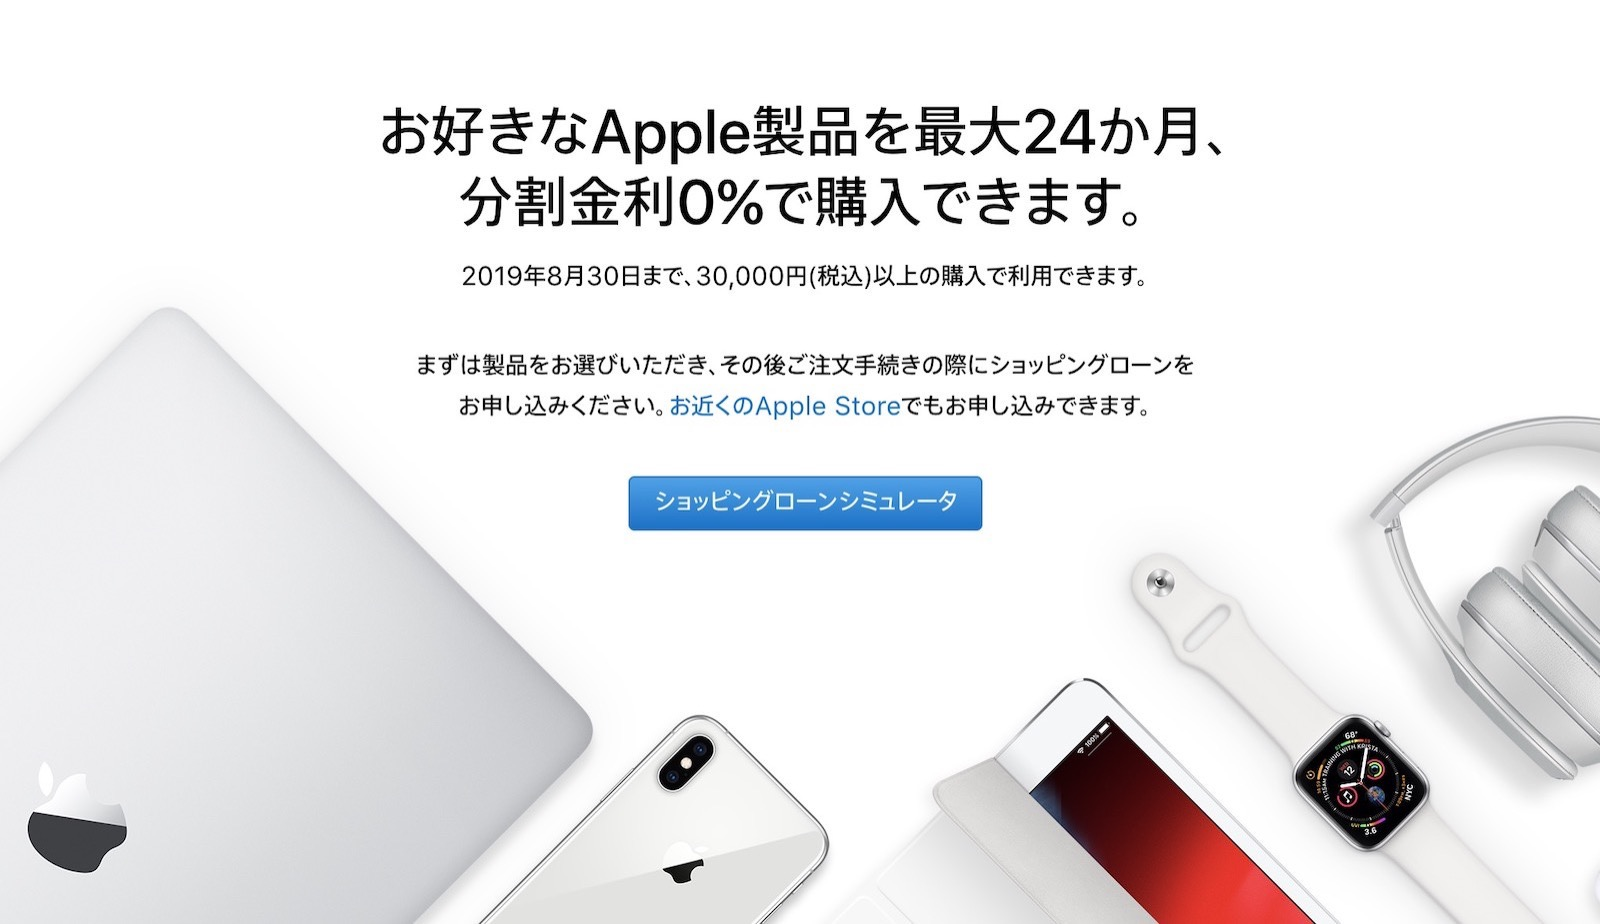 Apple Financing 20190830